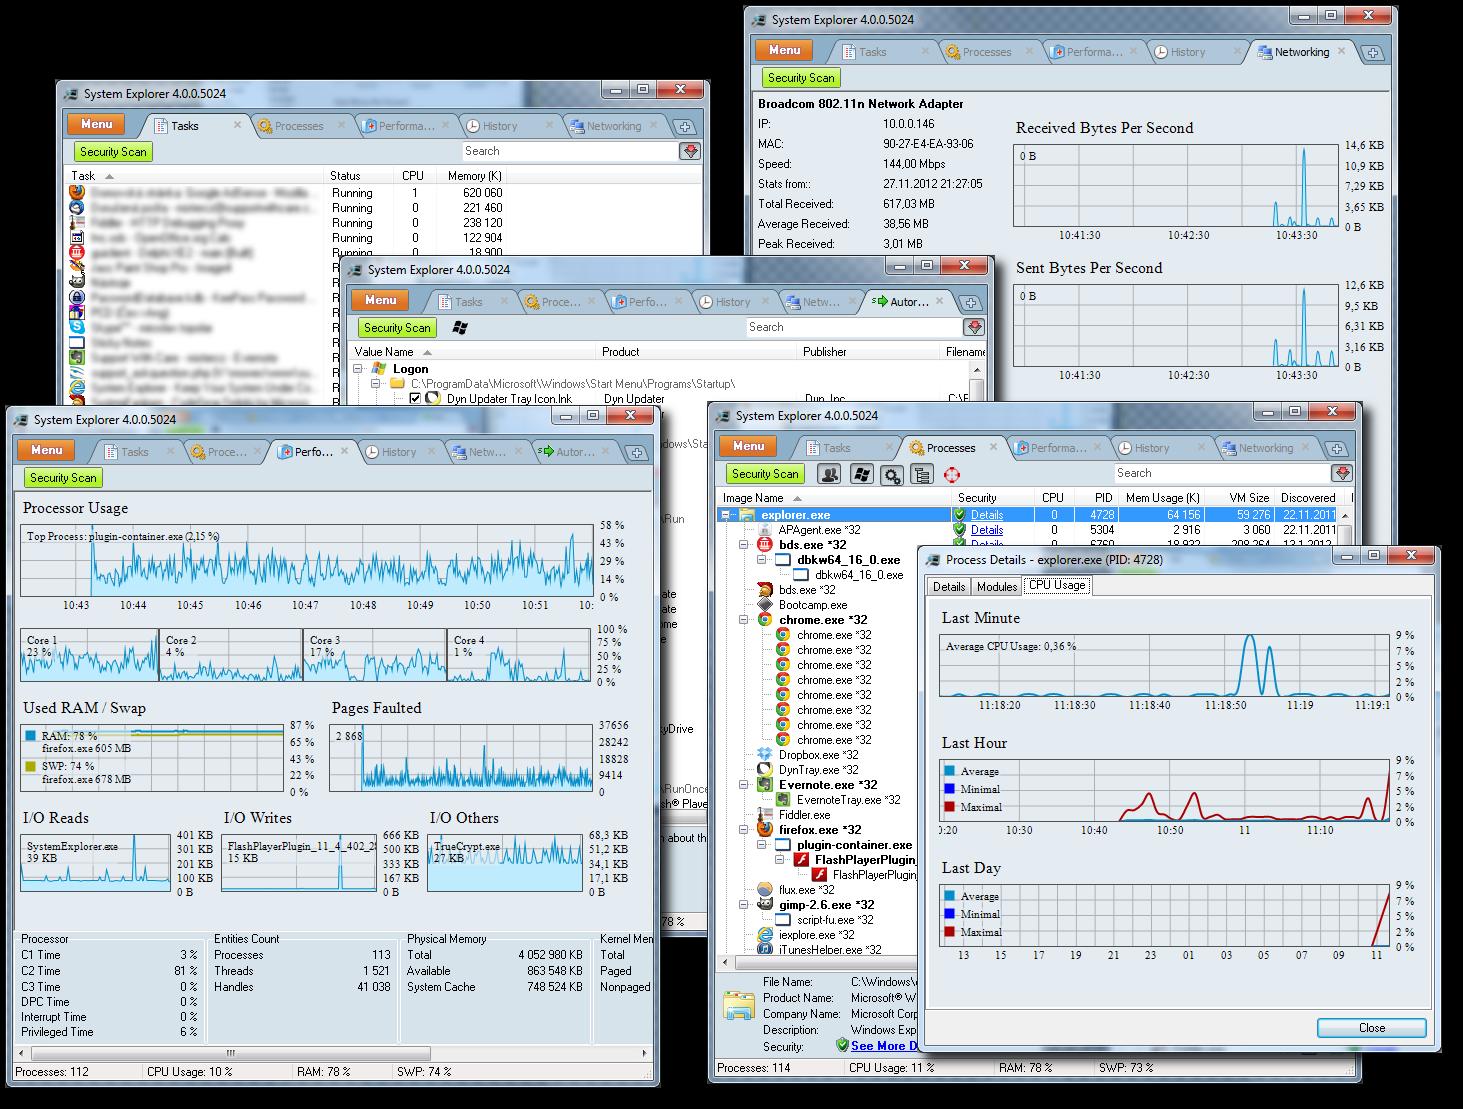 ������ System Explorer Portable 2.1.5.2980 1198517849-2.png